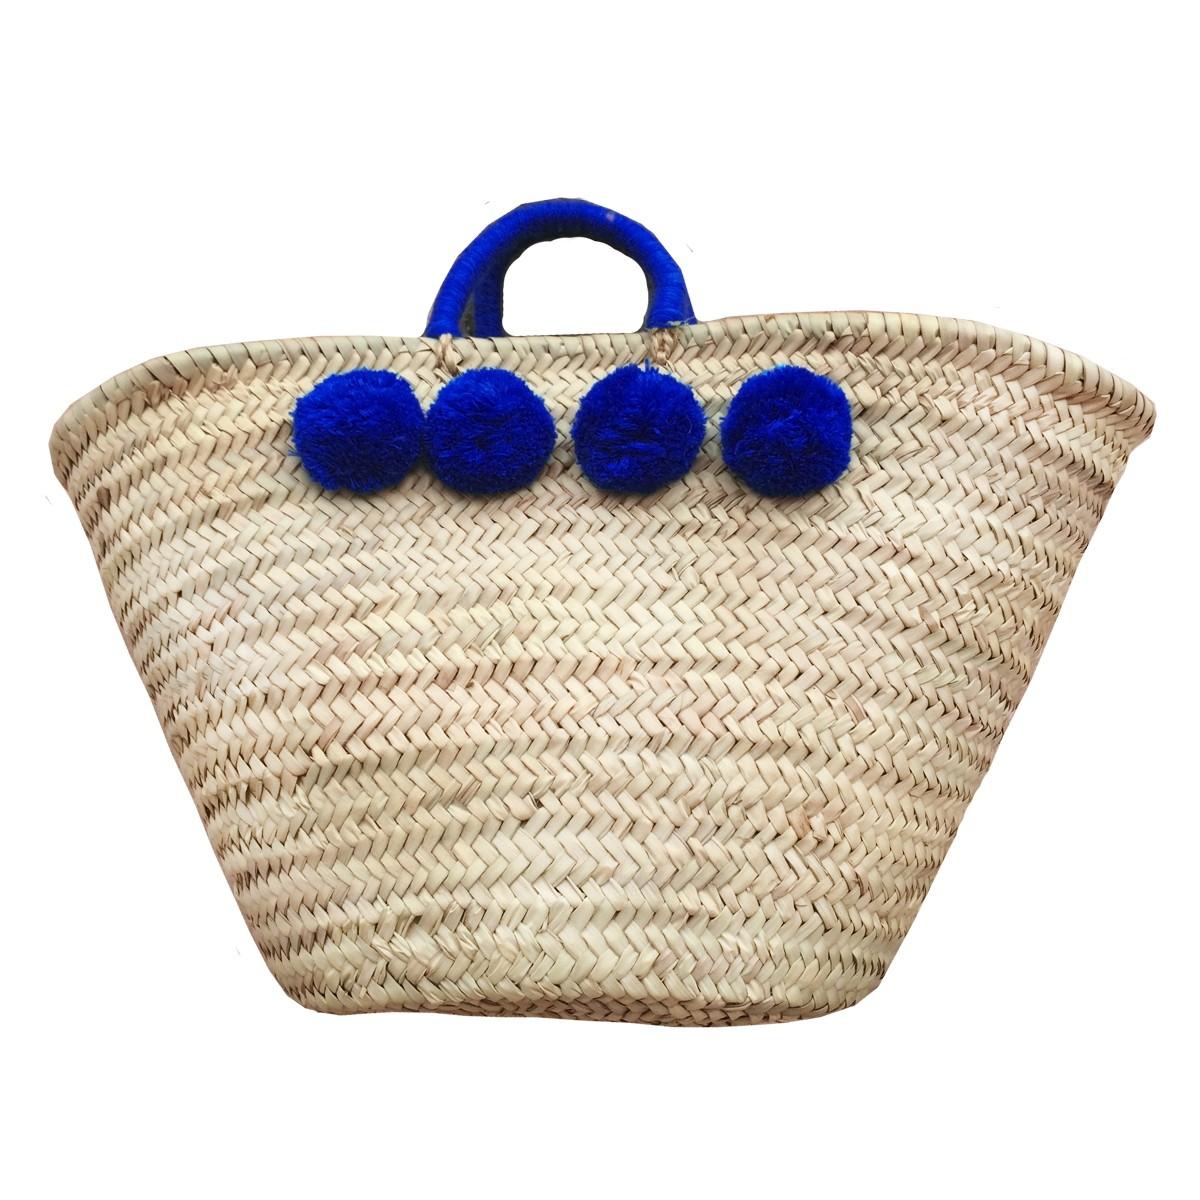 Basket wool 8 pom pom navy blue